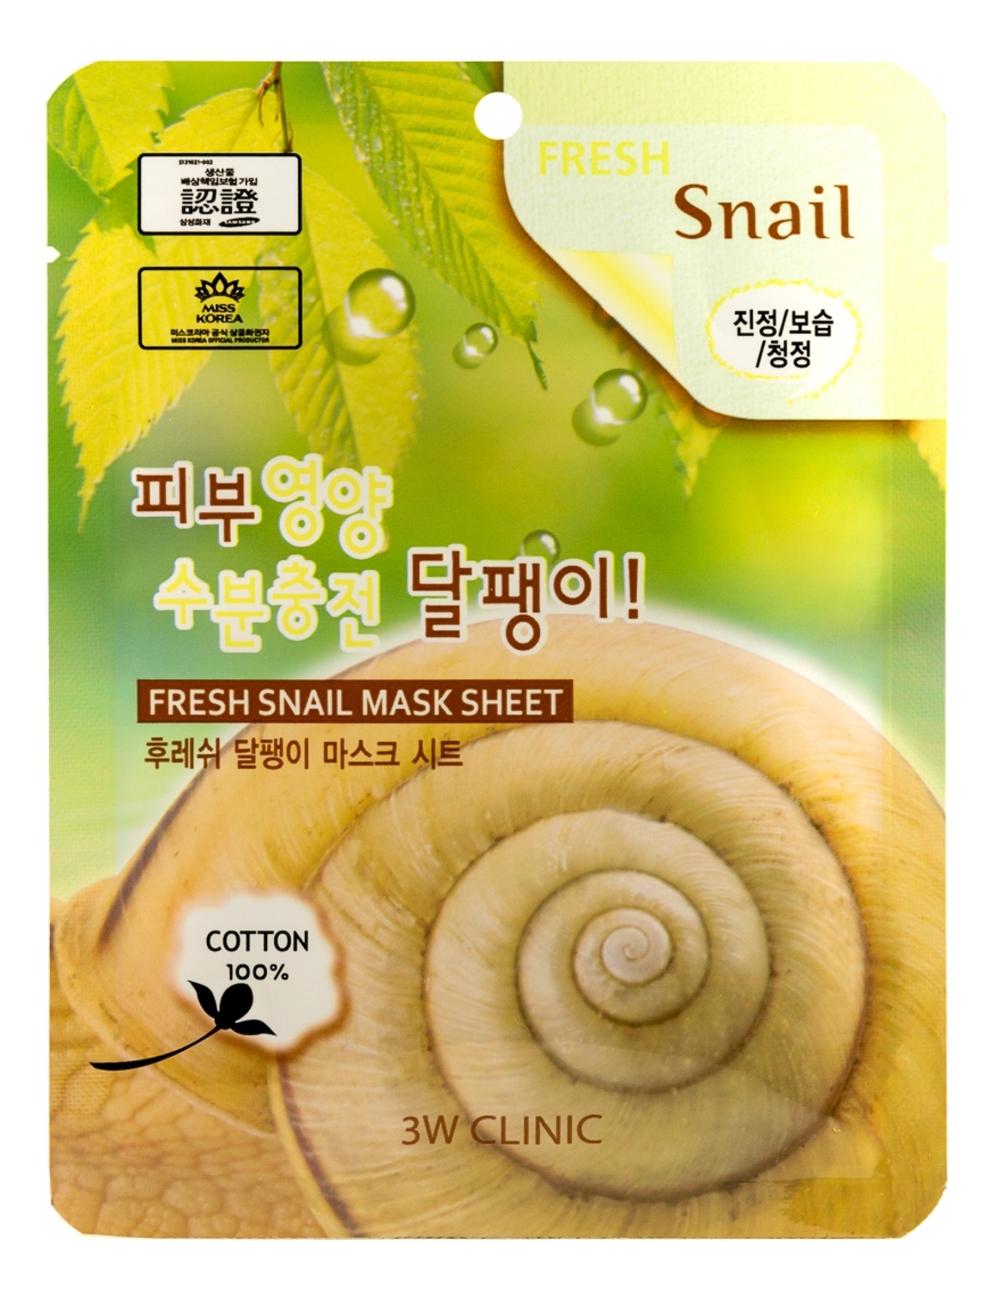 Тканевая маска для лица с секретом улитки Fresh Snail Mask Sheet: Маска 23г